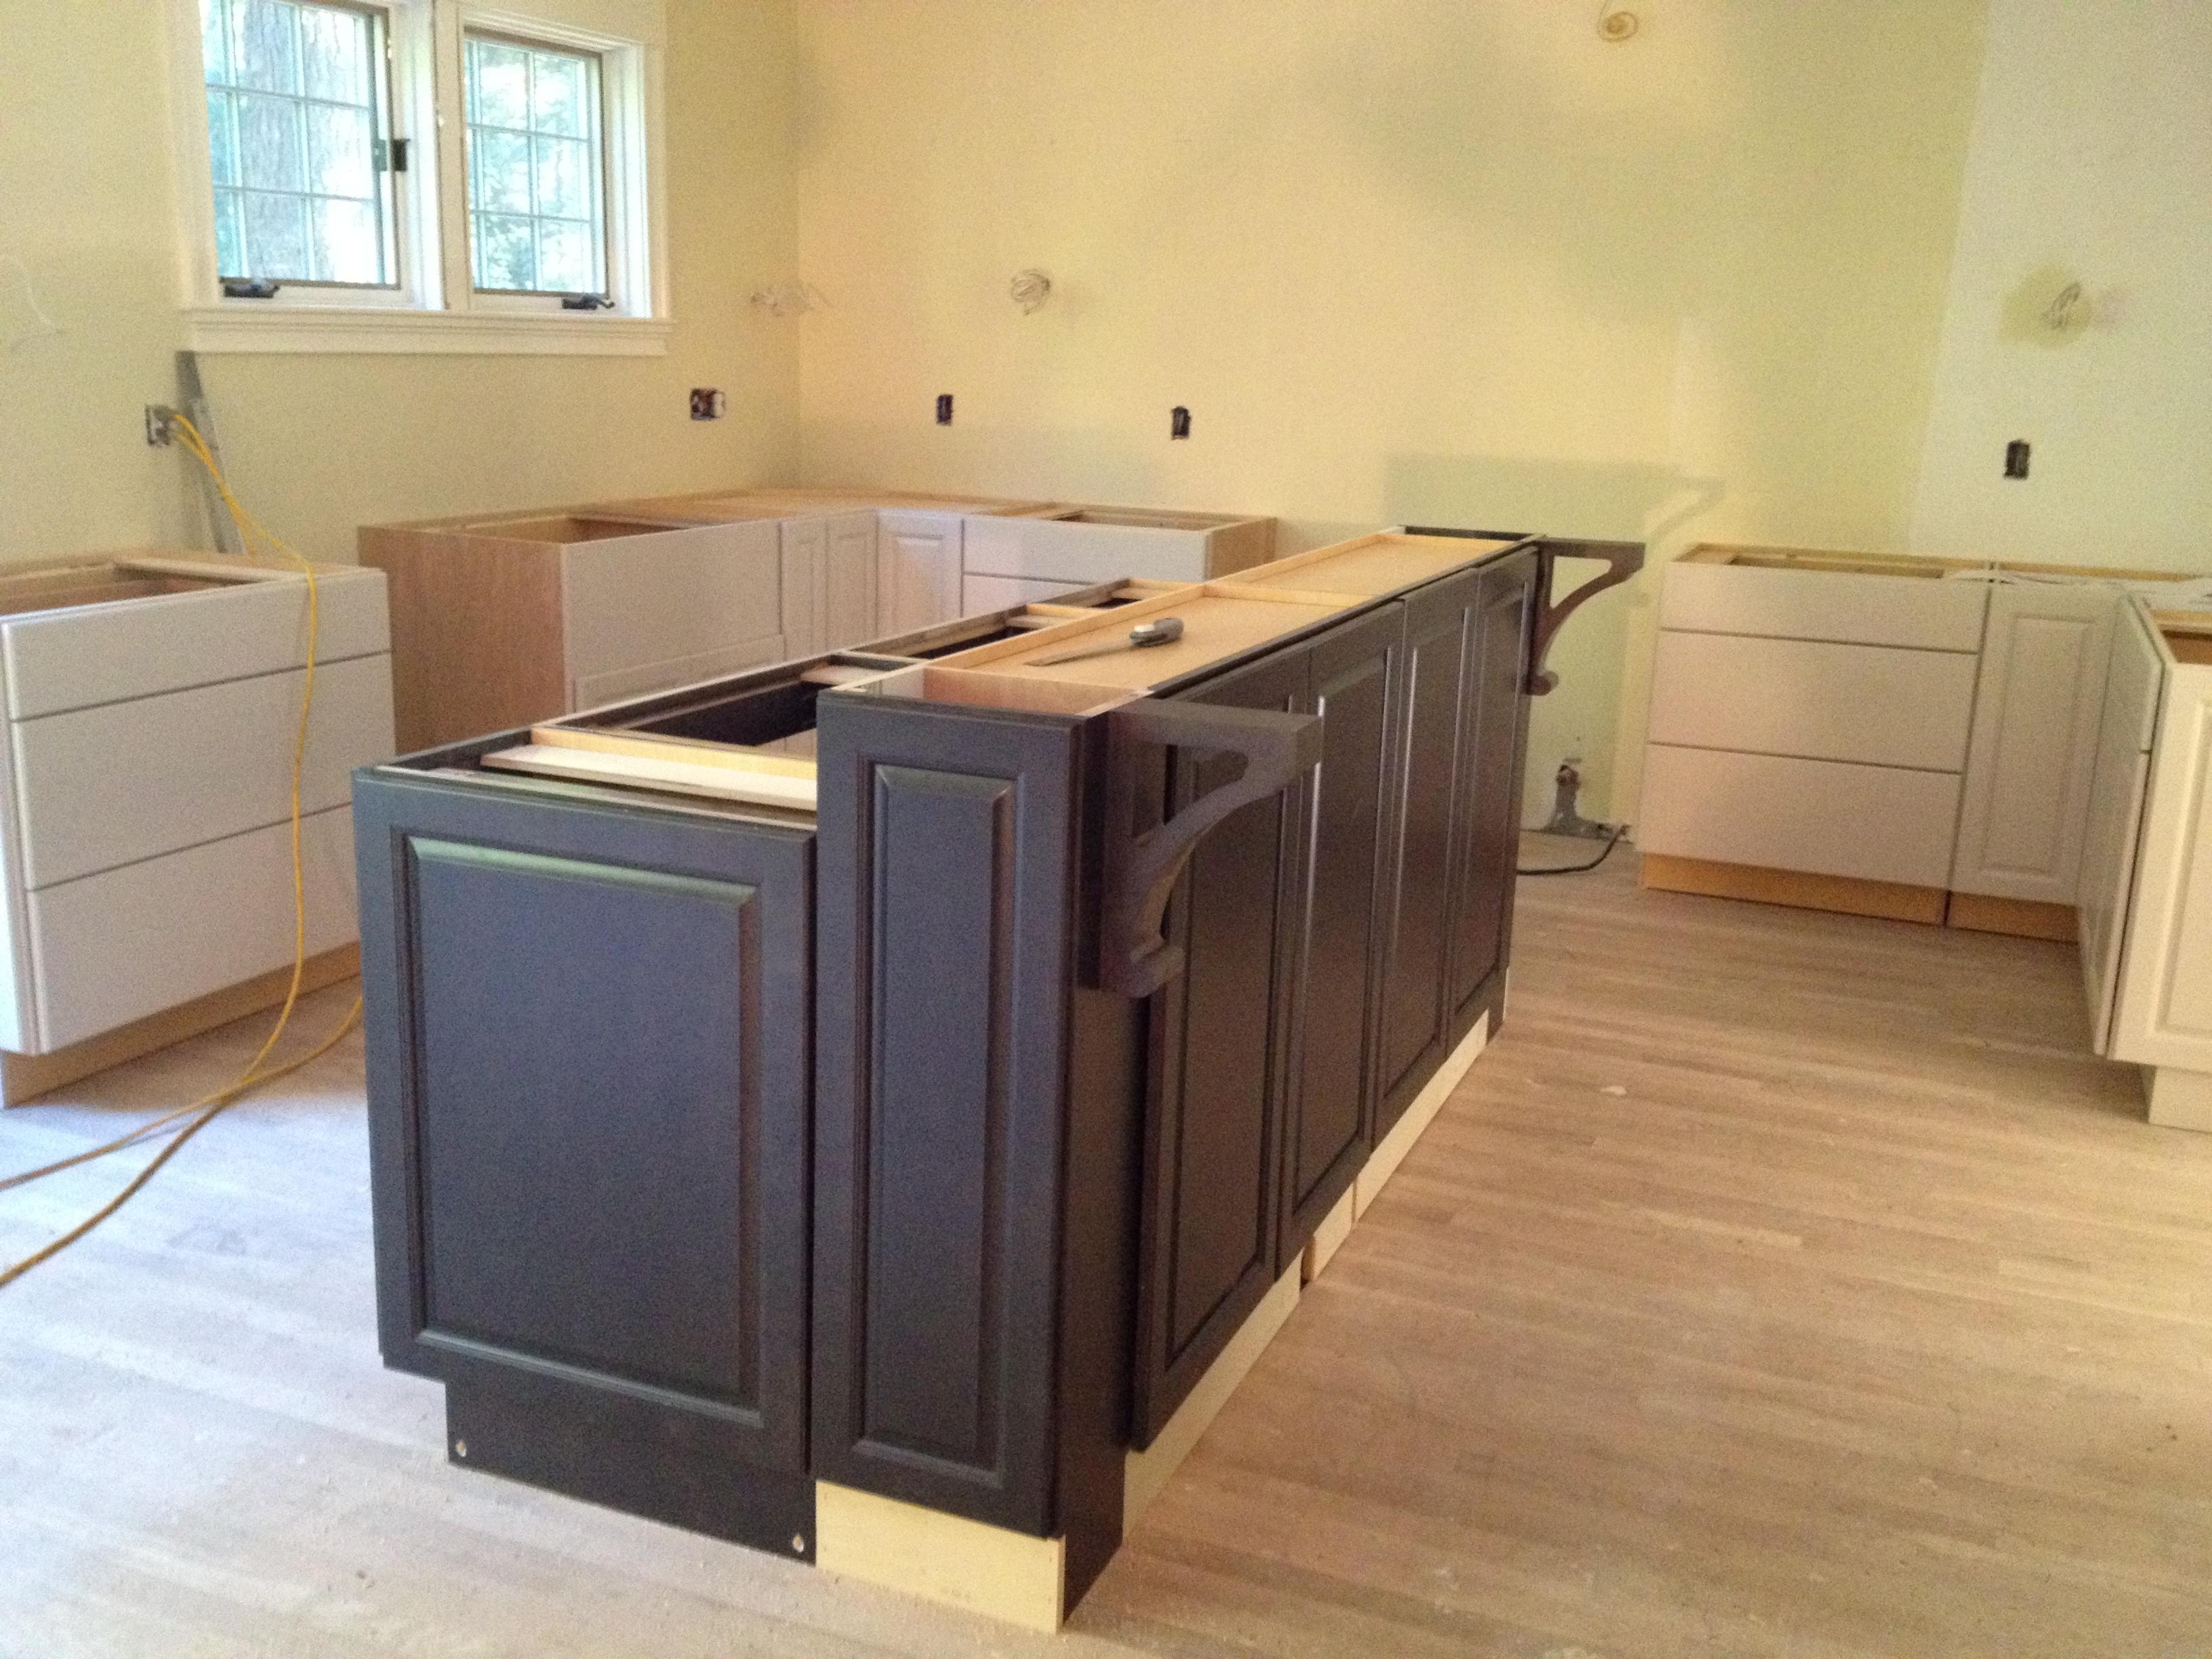 Download Kitchen Island Plans Woodworking Plans Diy